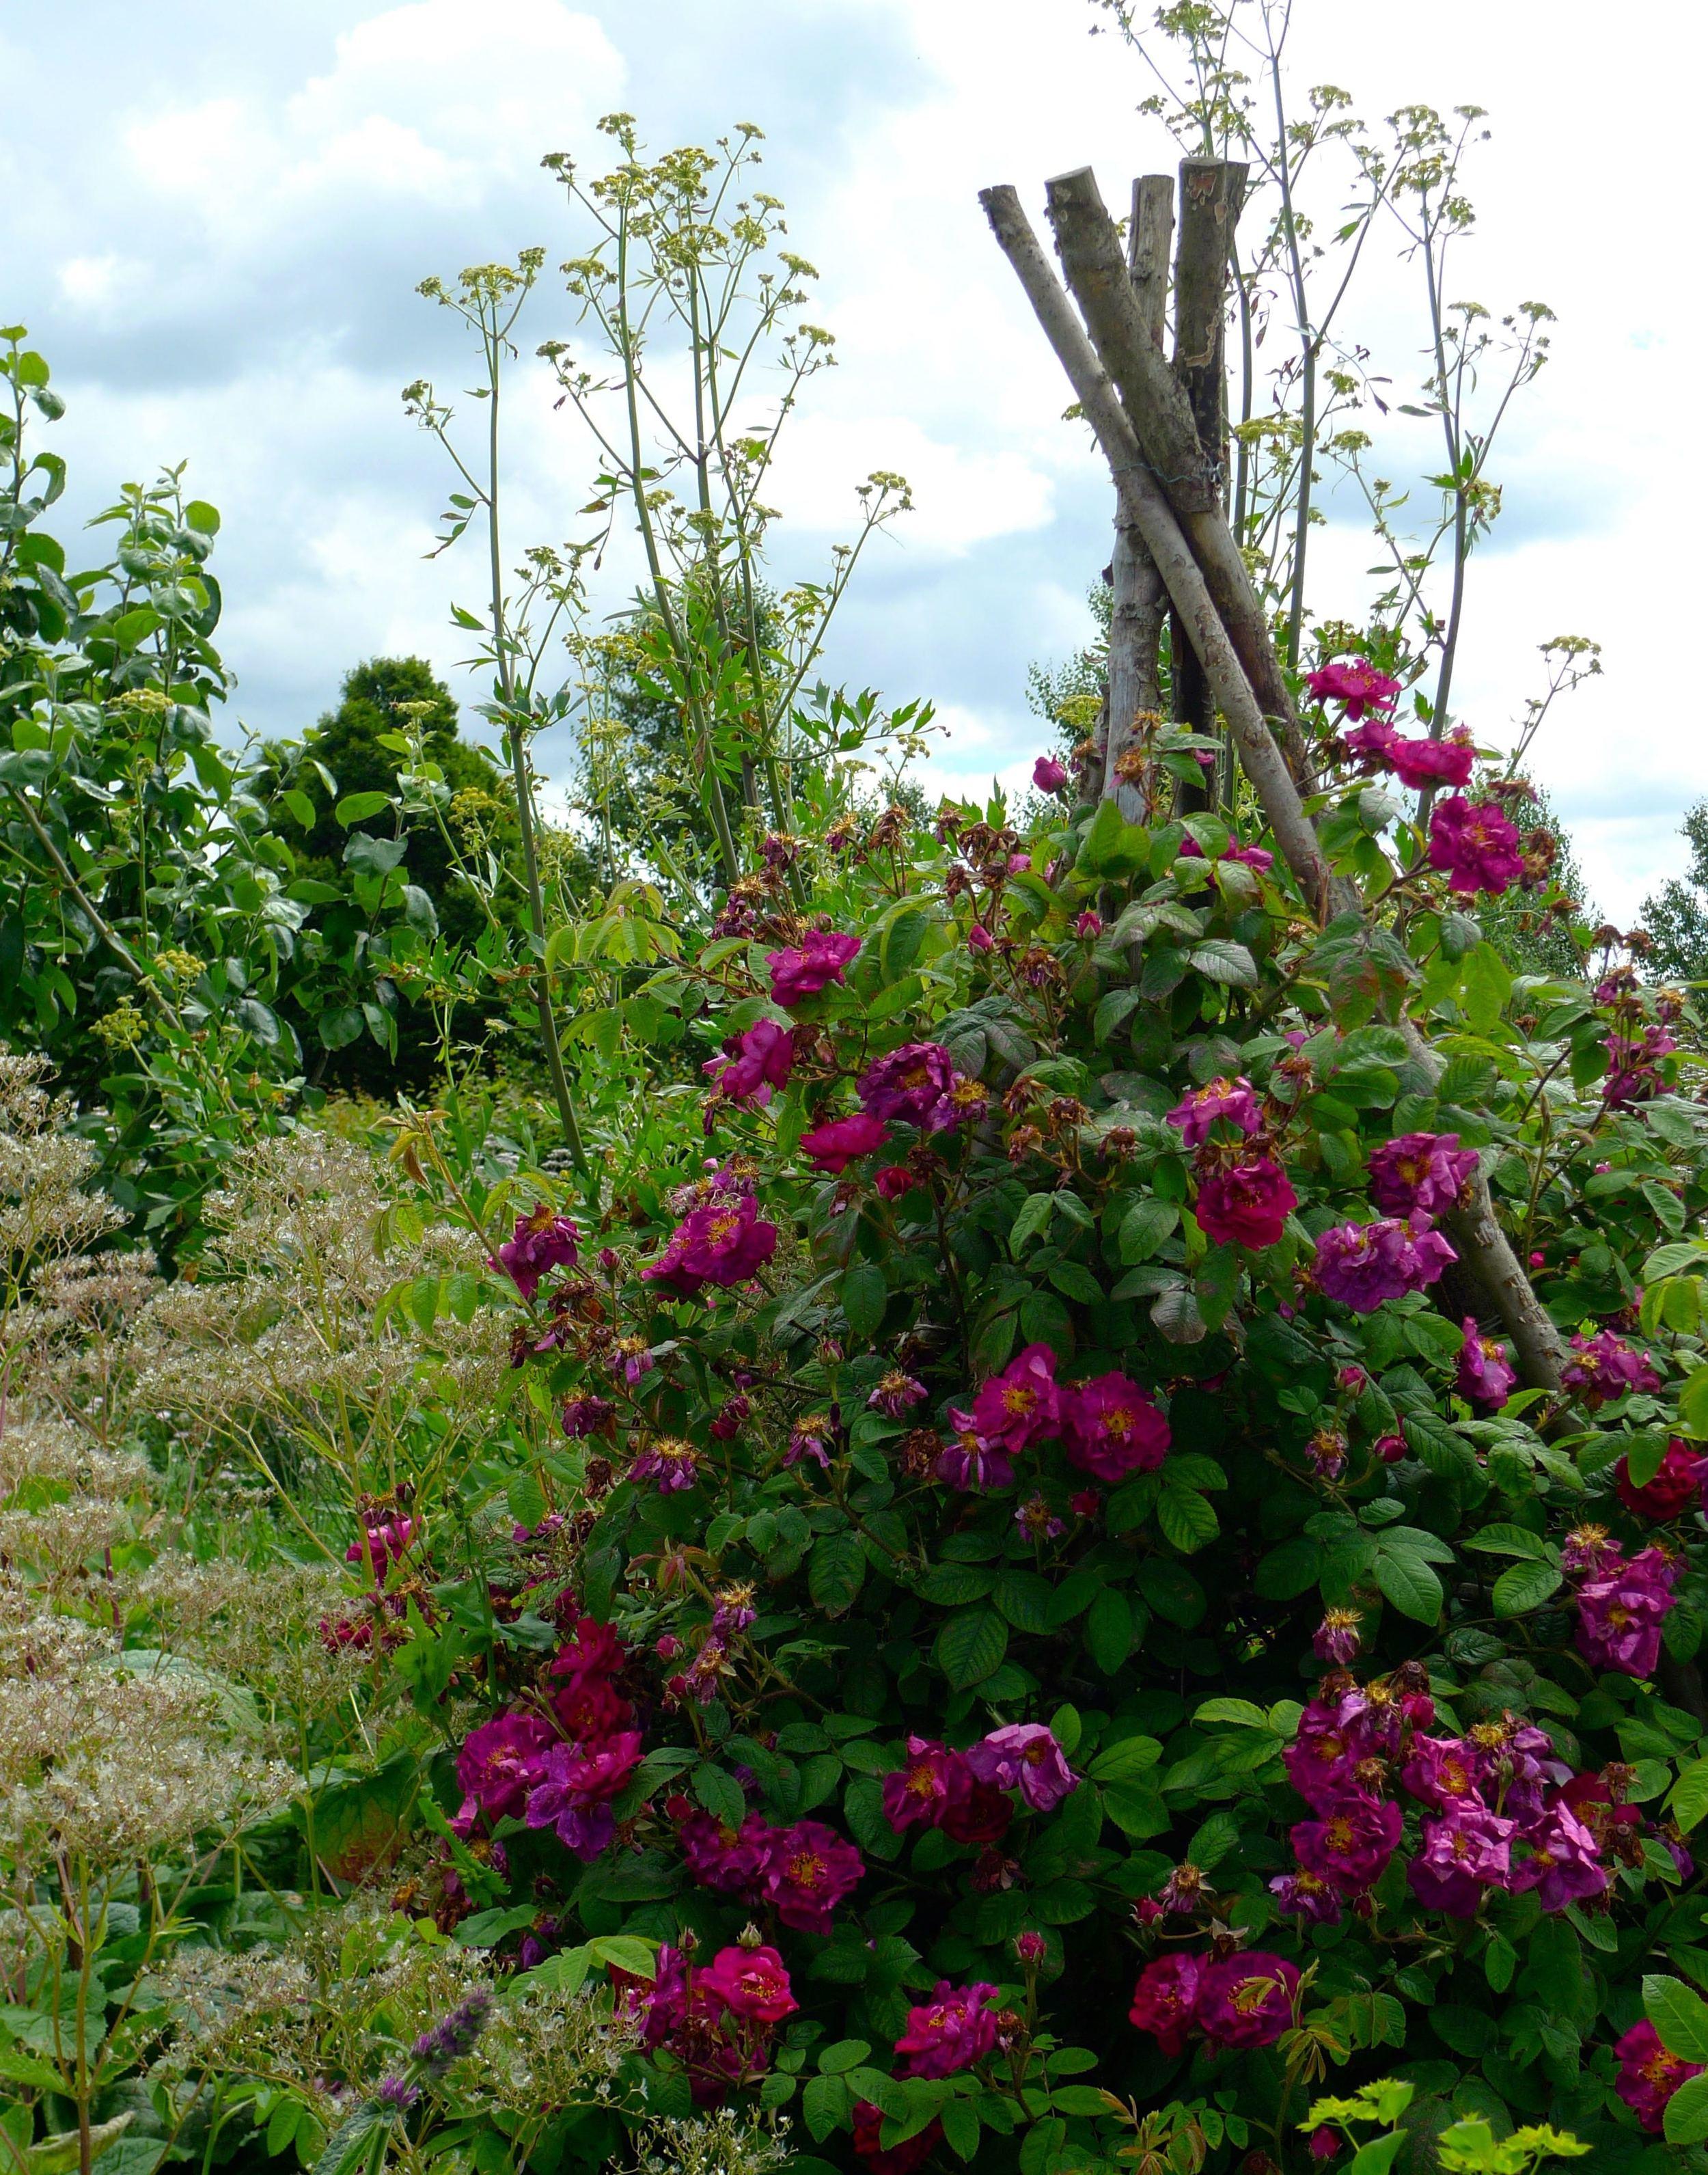 A wigwam of roses